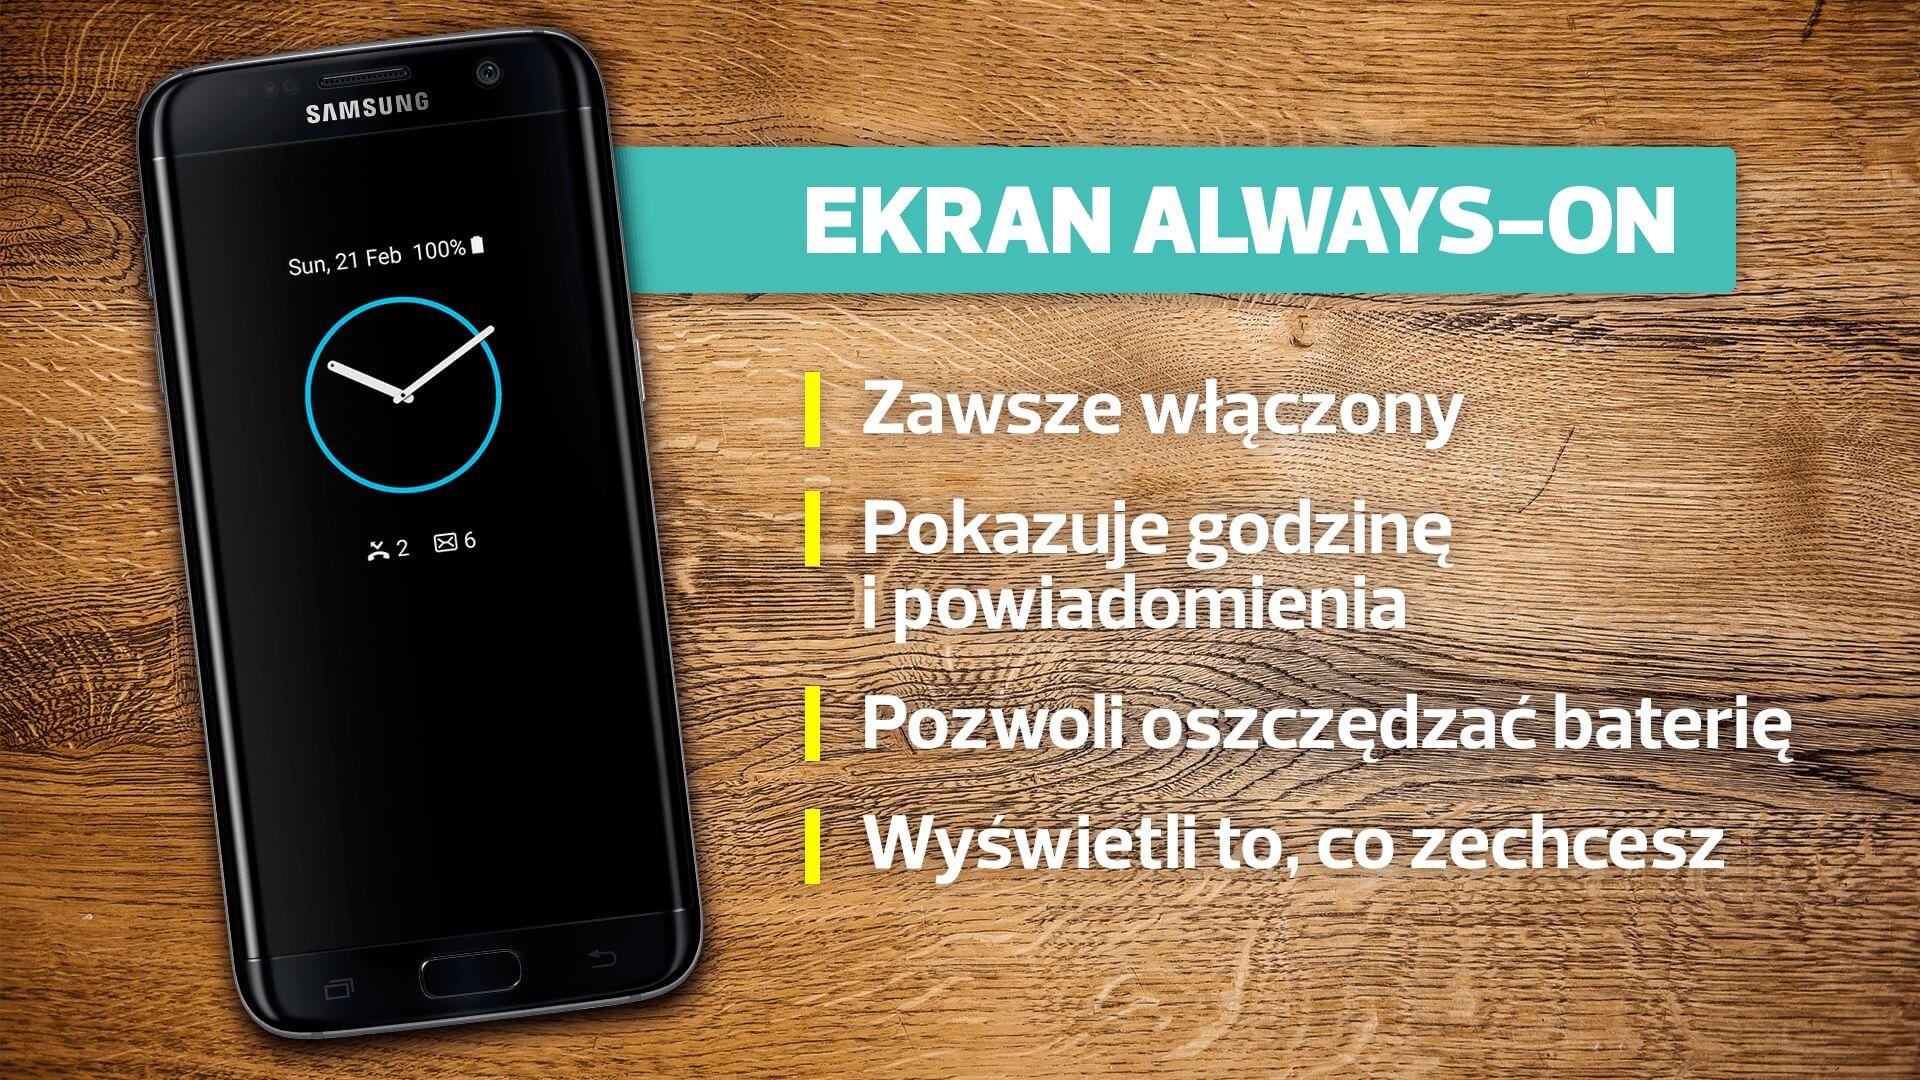 Samsung Galaxy S7 Edge always on